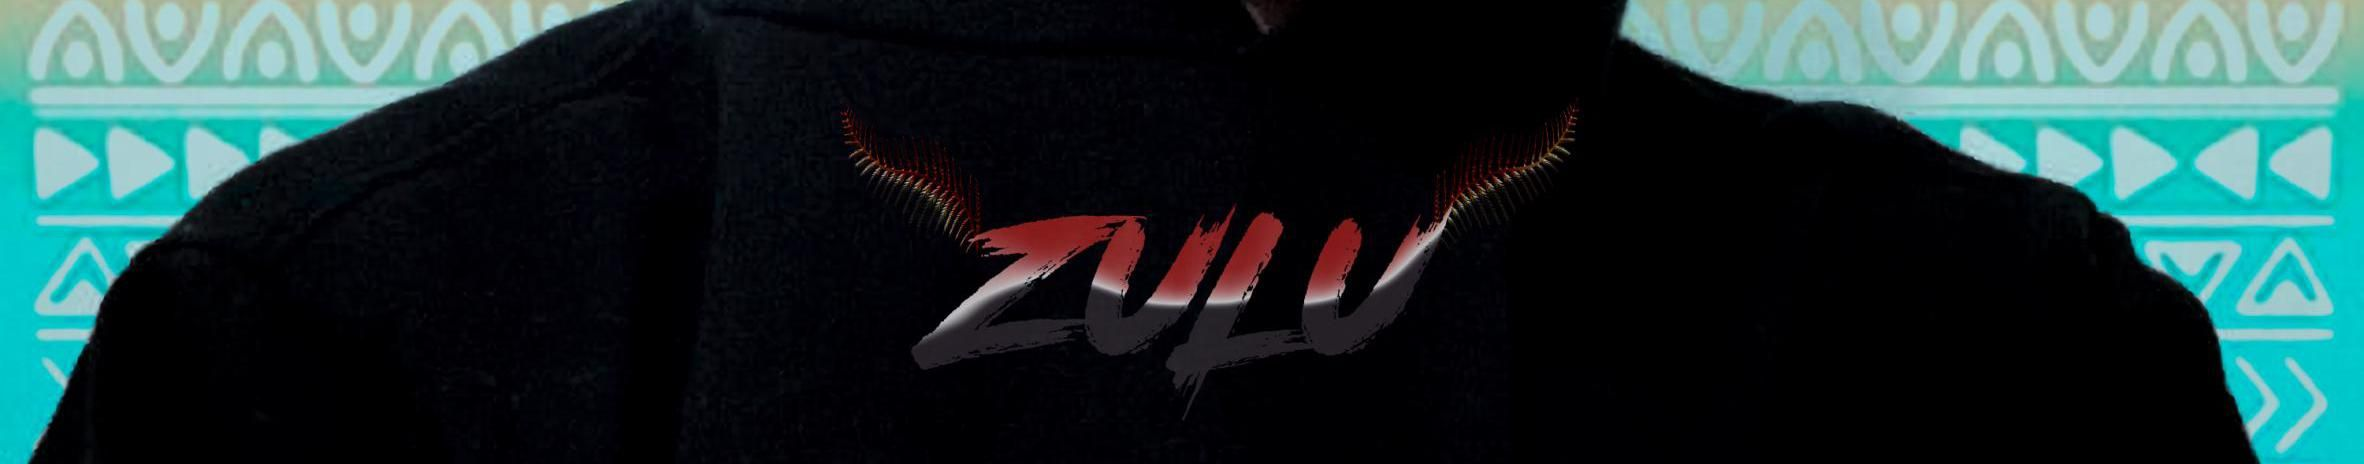 Imagem de capa de ZuLu